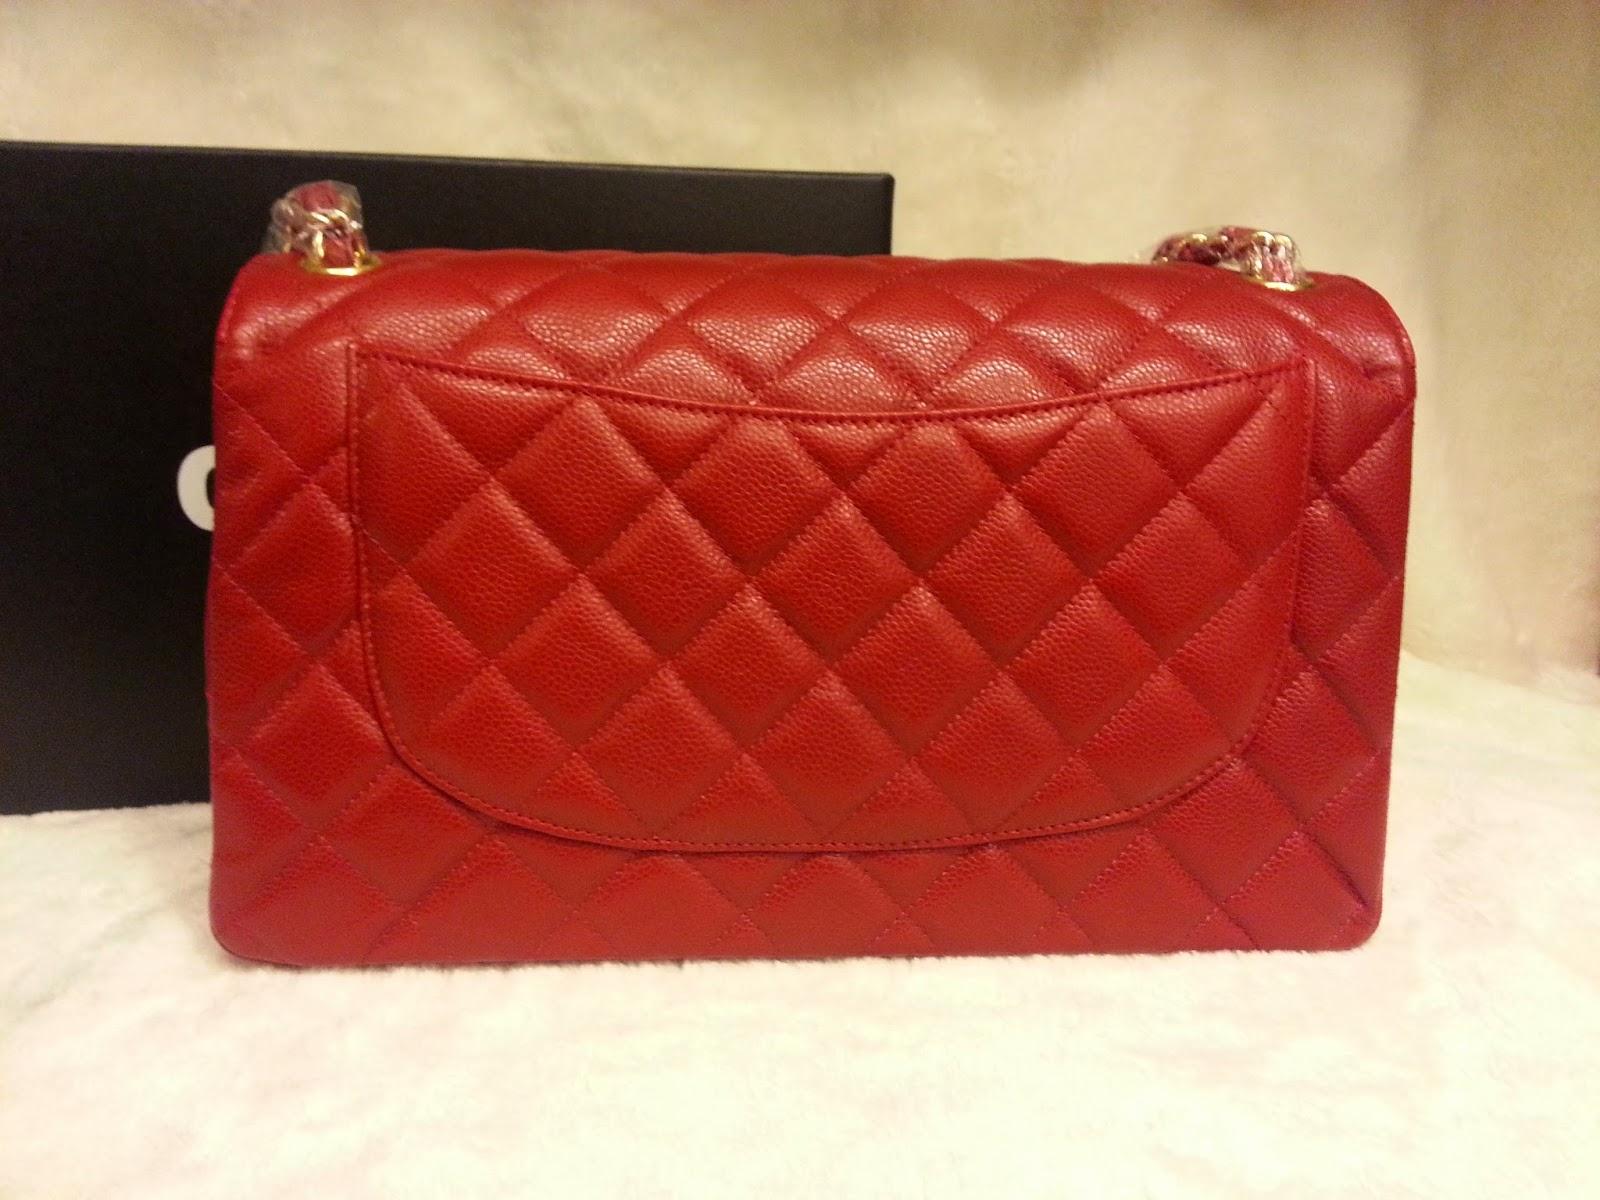 0c86e84798f5 Deal Treasure: Chanel Classic Jumbo Red Caviar Leather Double Flap ...